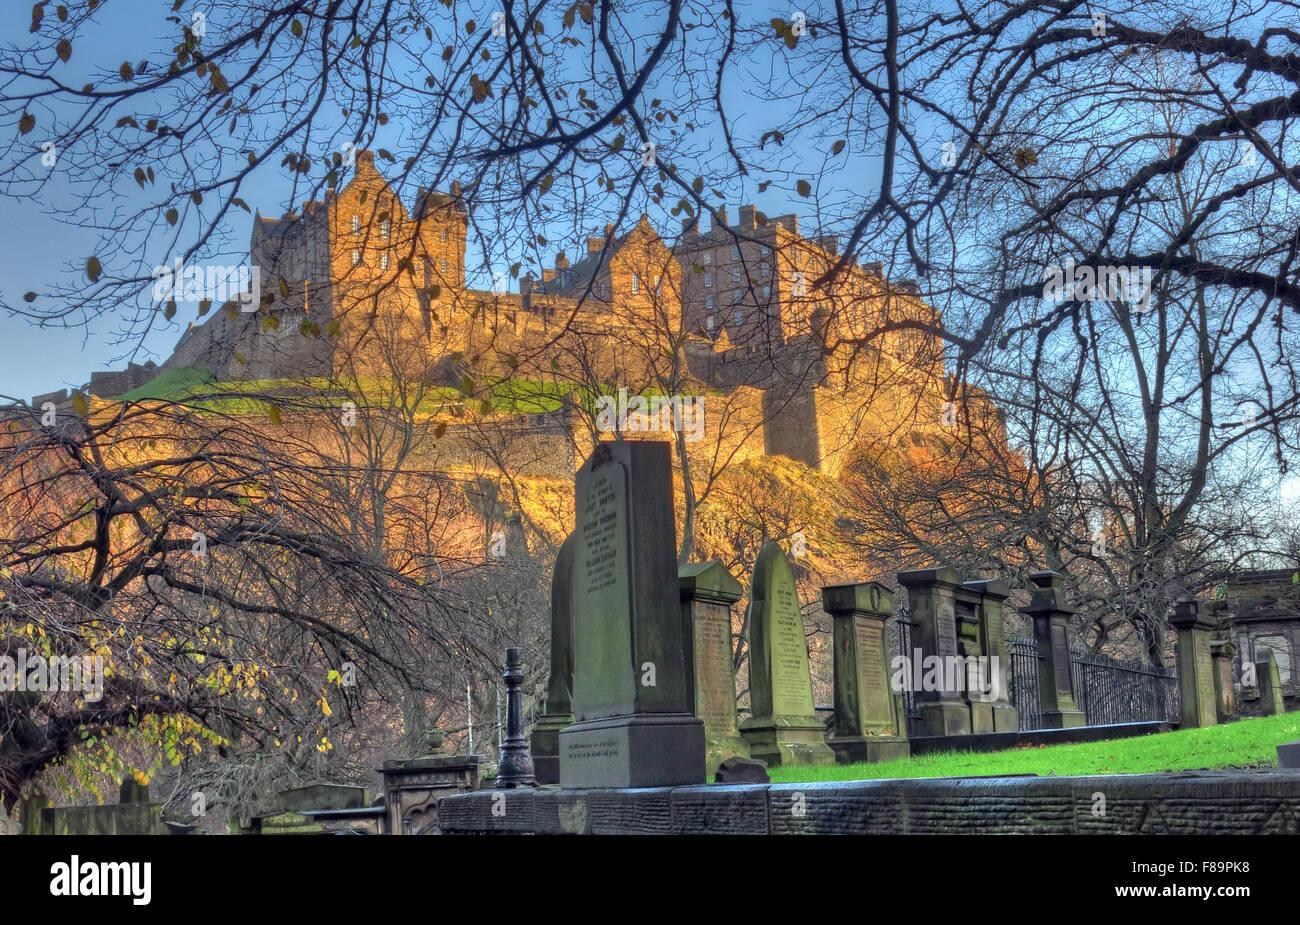 Edinburgh Castle in Winter, Scotland, UK from St Cuthberts graveyard - Stock Image